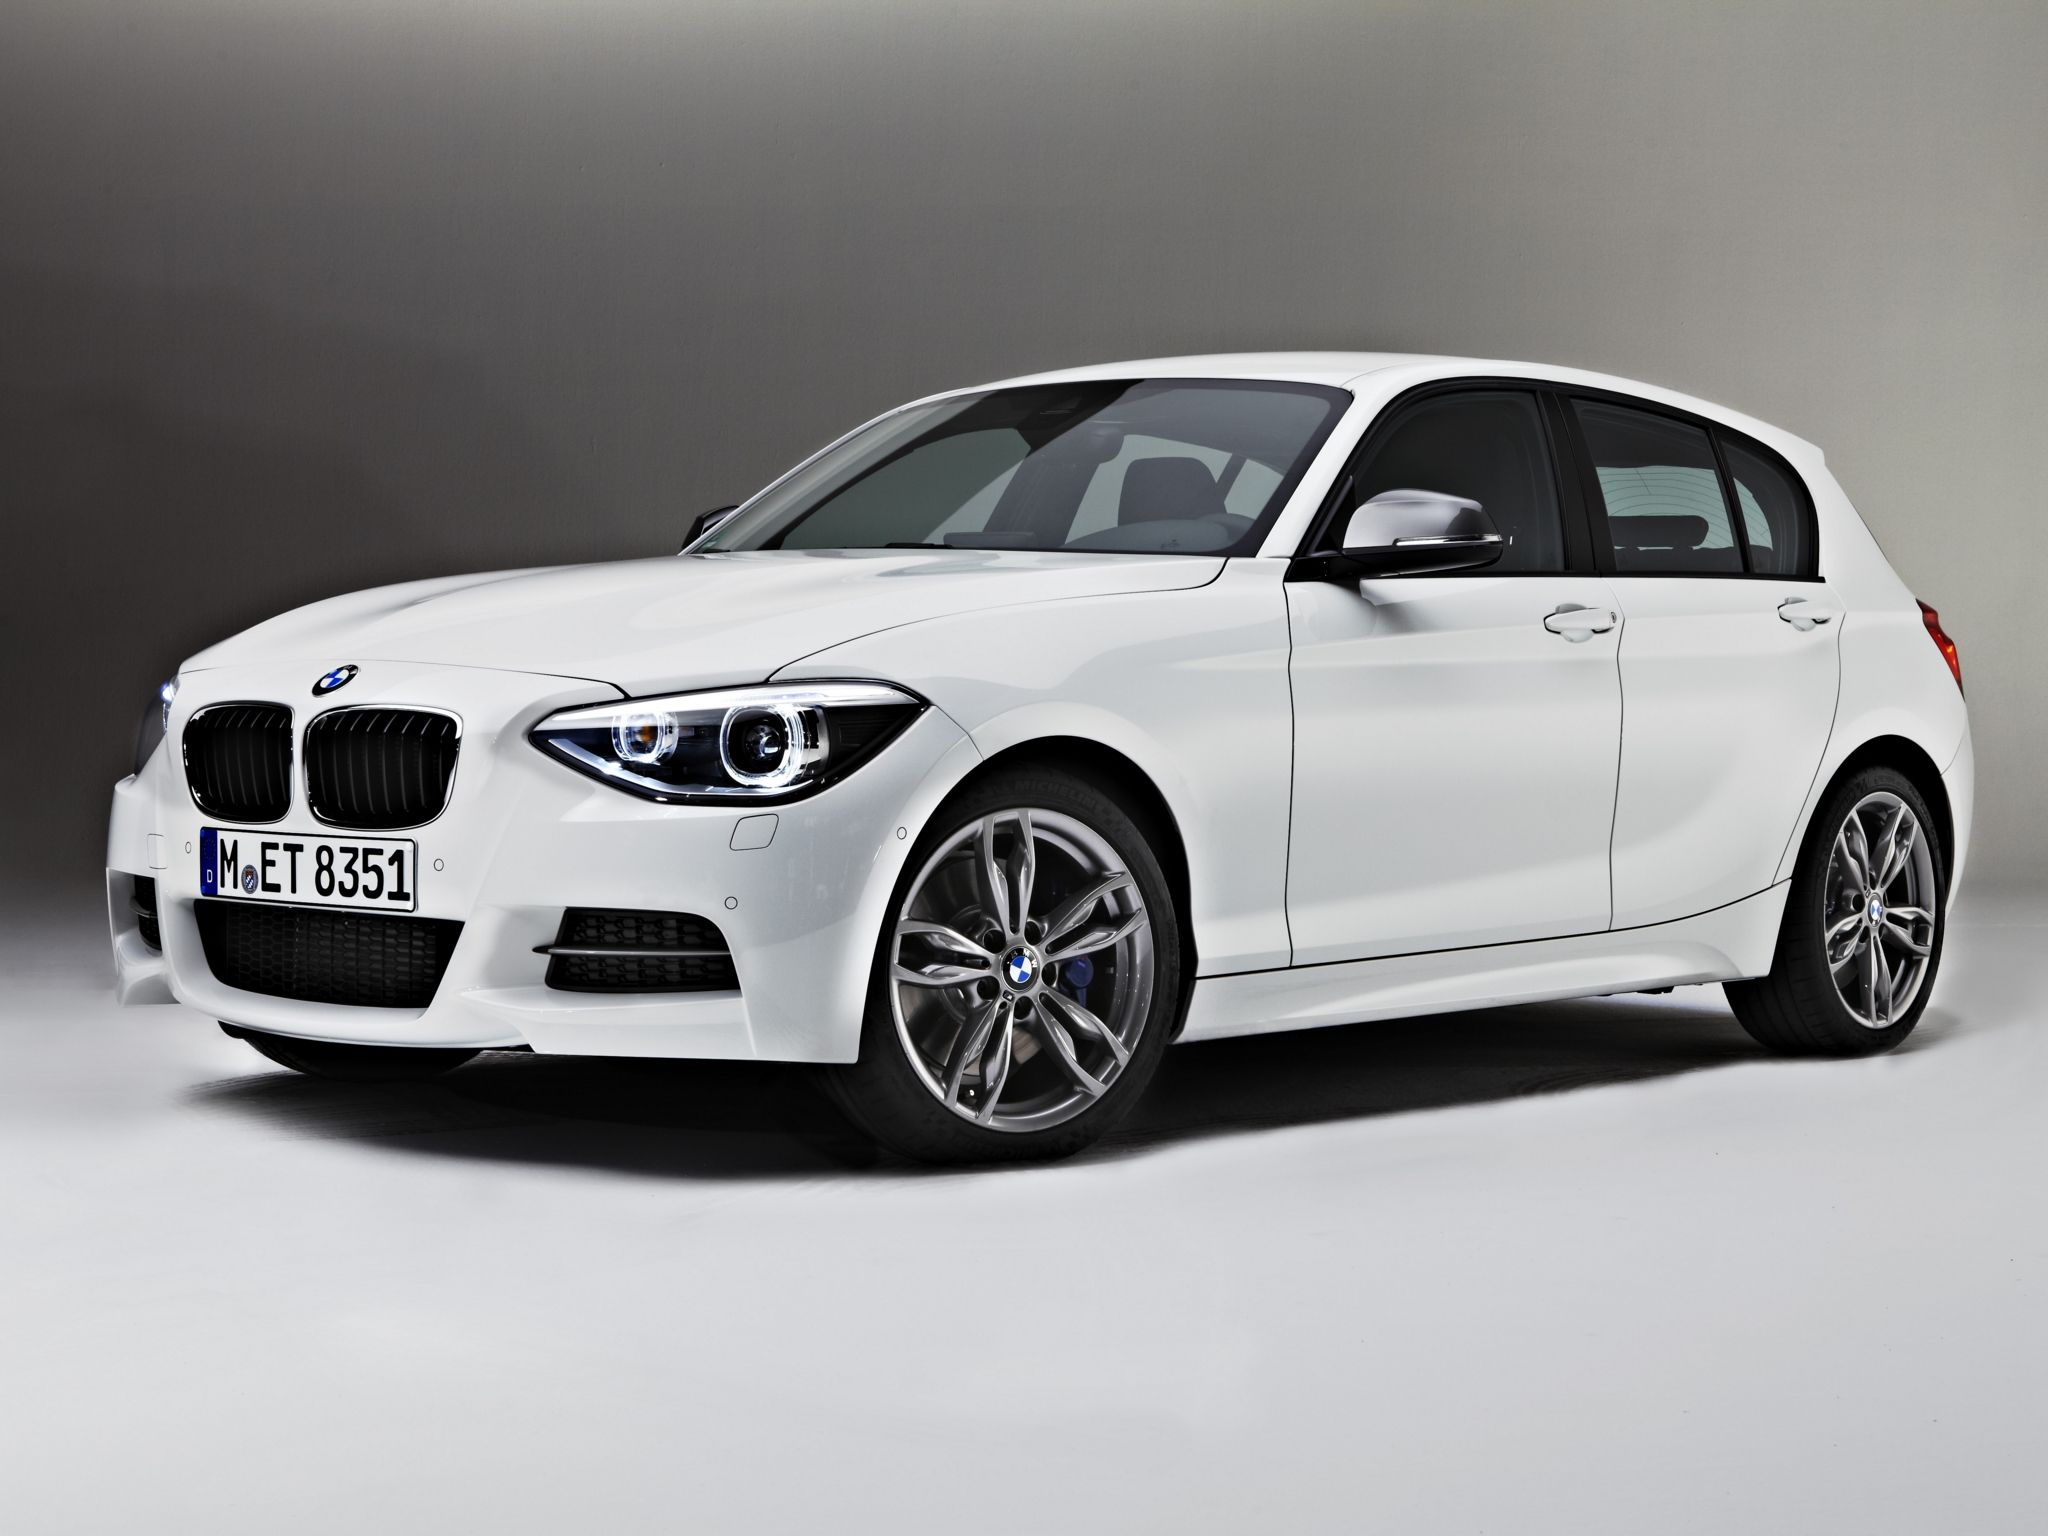 BMW I BMW Cars Background Wallpapers On Desktop Nexus